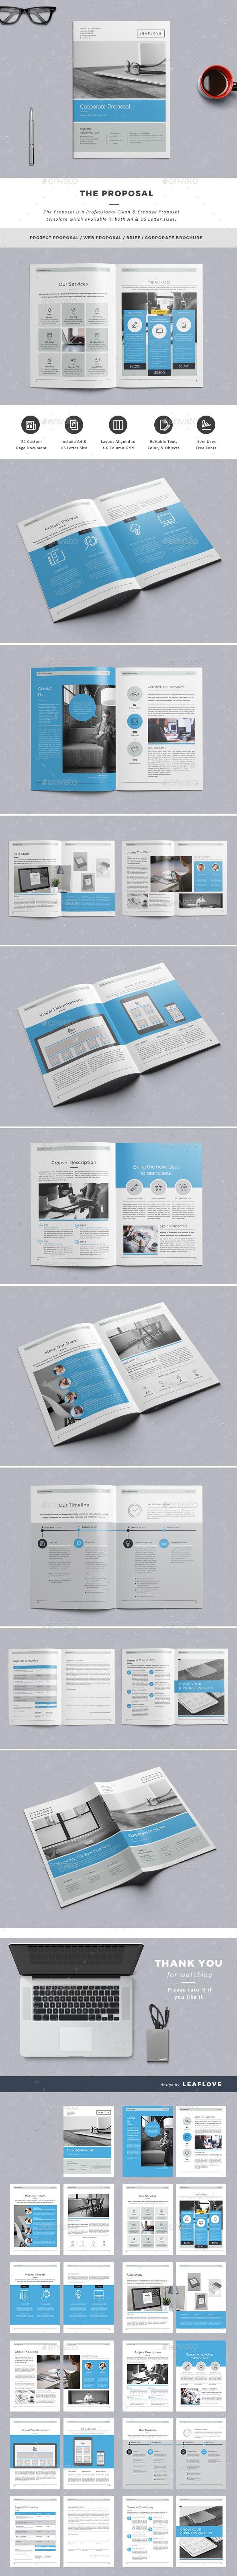 Proposal Template InDesign INDD #design Download: http://graphicriver.net/item/the-proposal/13596310?ref=ksioks